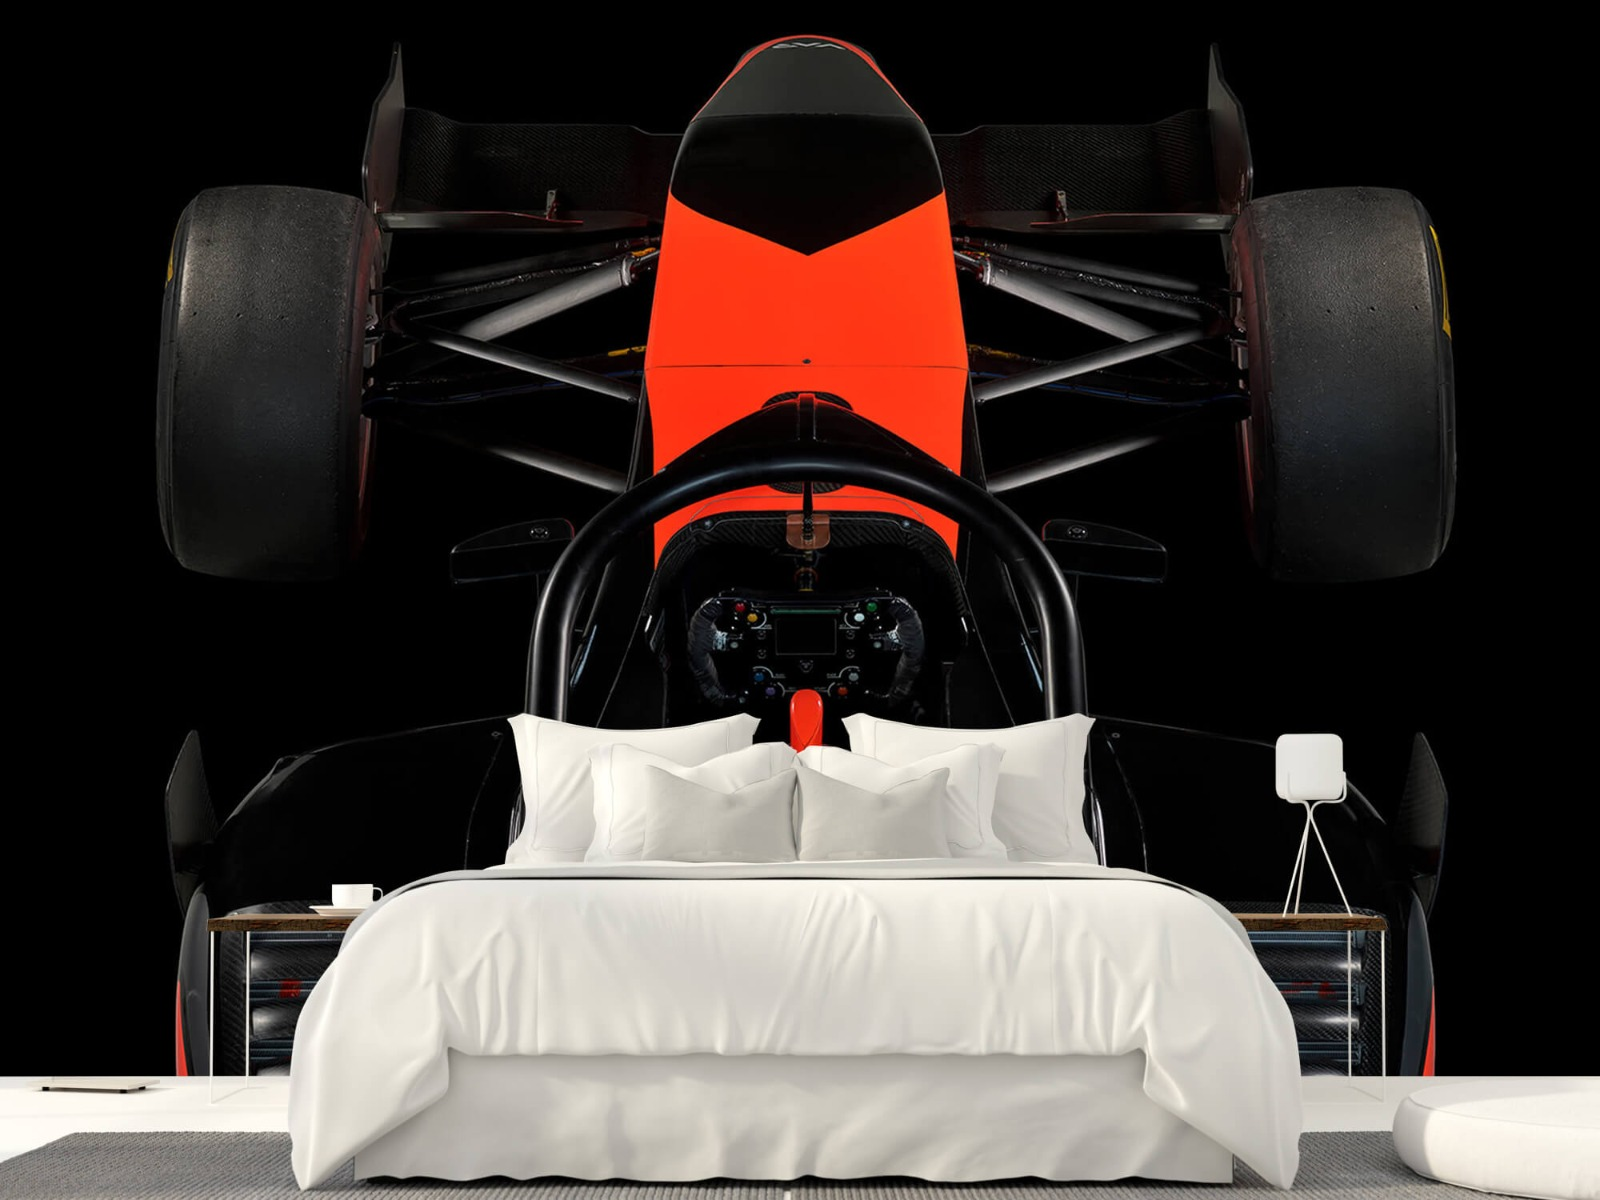 Sportauto's - Formule 3 - Cockpit view - dark - Tienerkamer 23